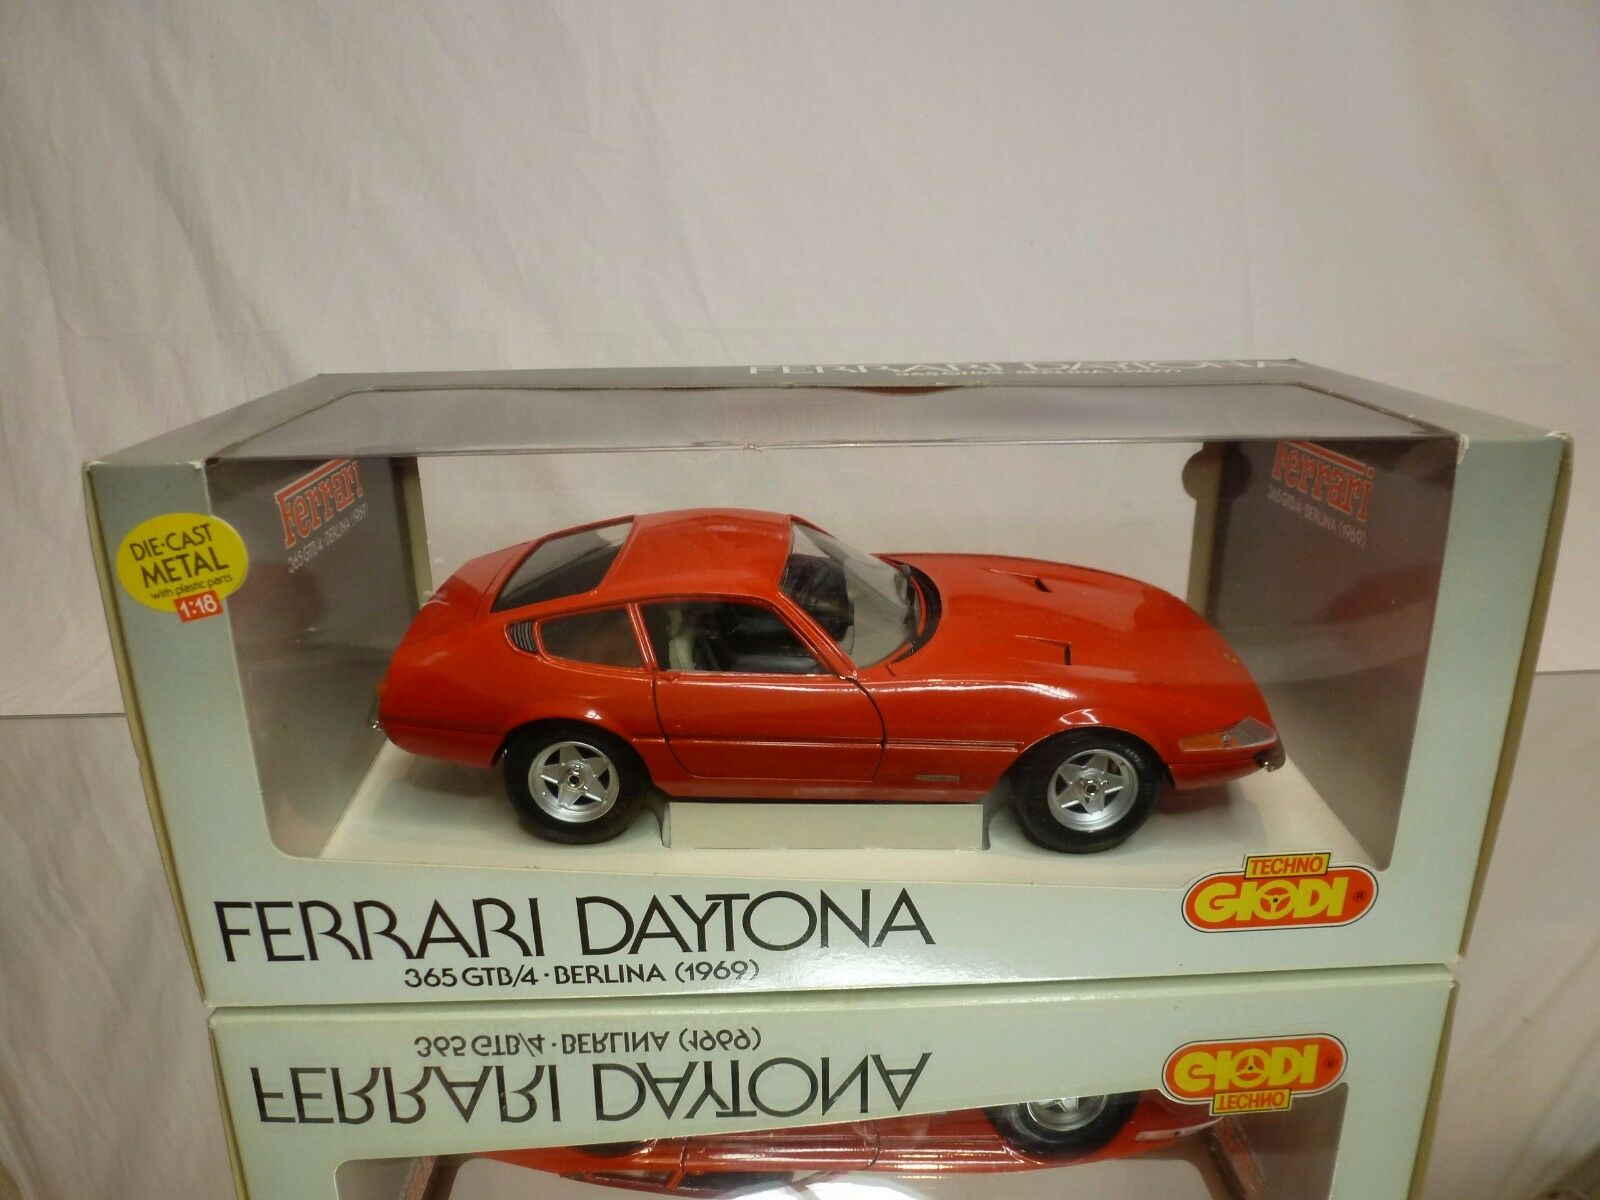 GIODI 740011 FERRARI DAYTONA 365 GTB 4 BERLINA 1969 rojo 1 18 - EXCELLENT IN BOX